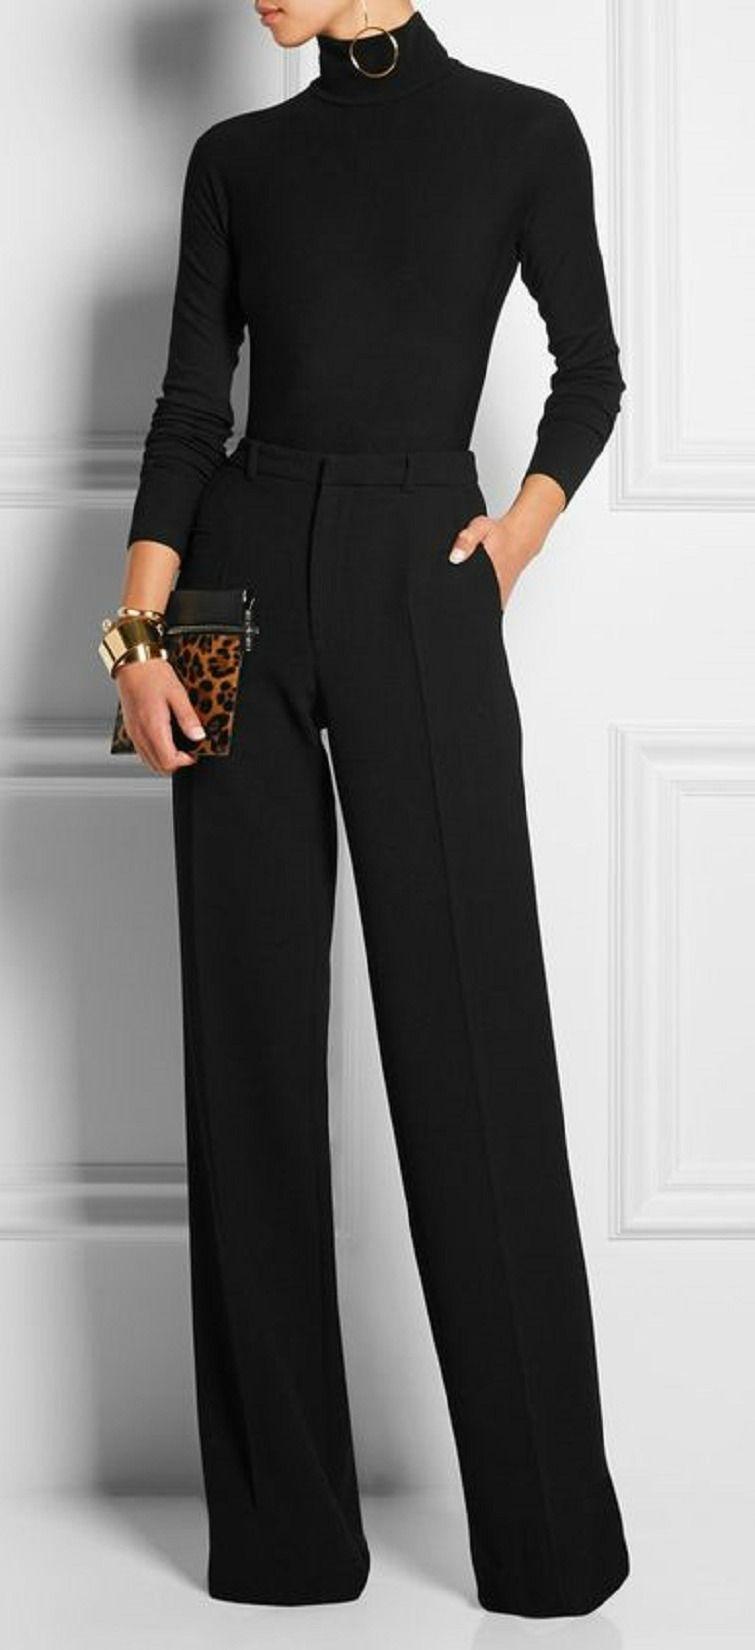 Long black dress pants